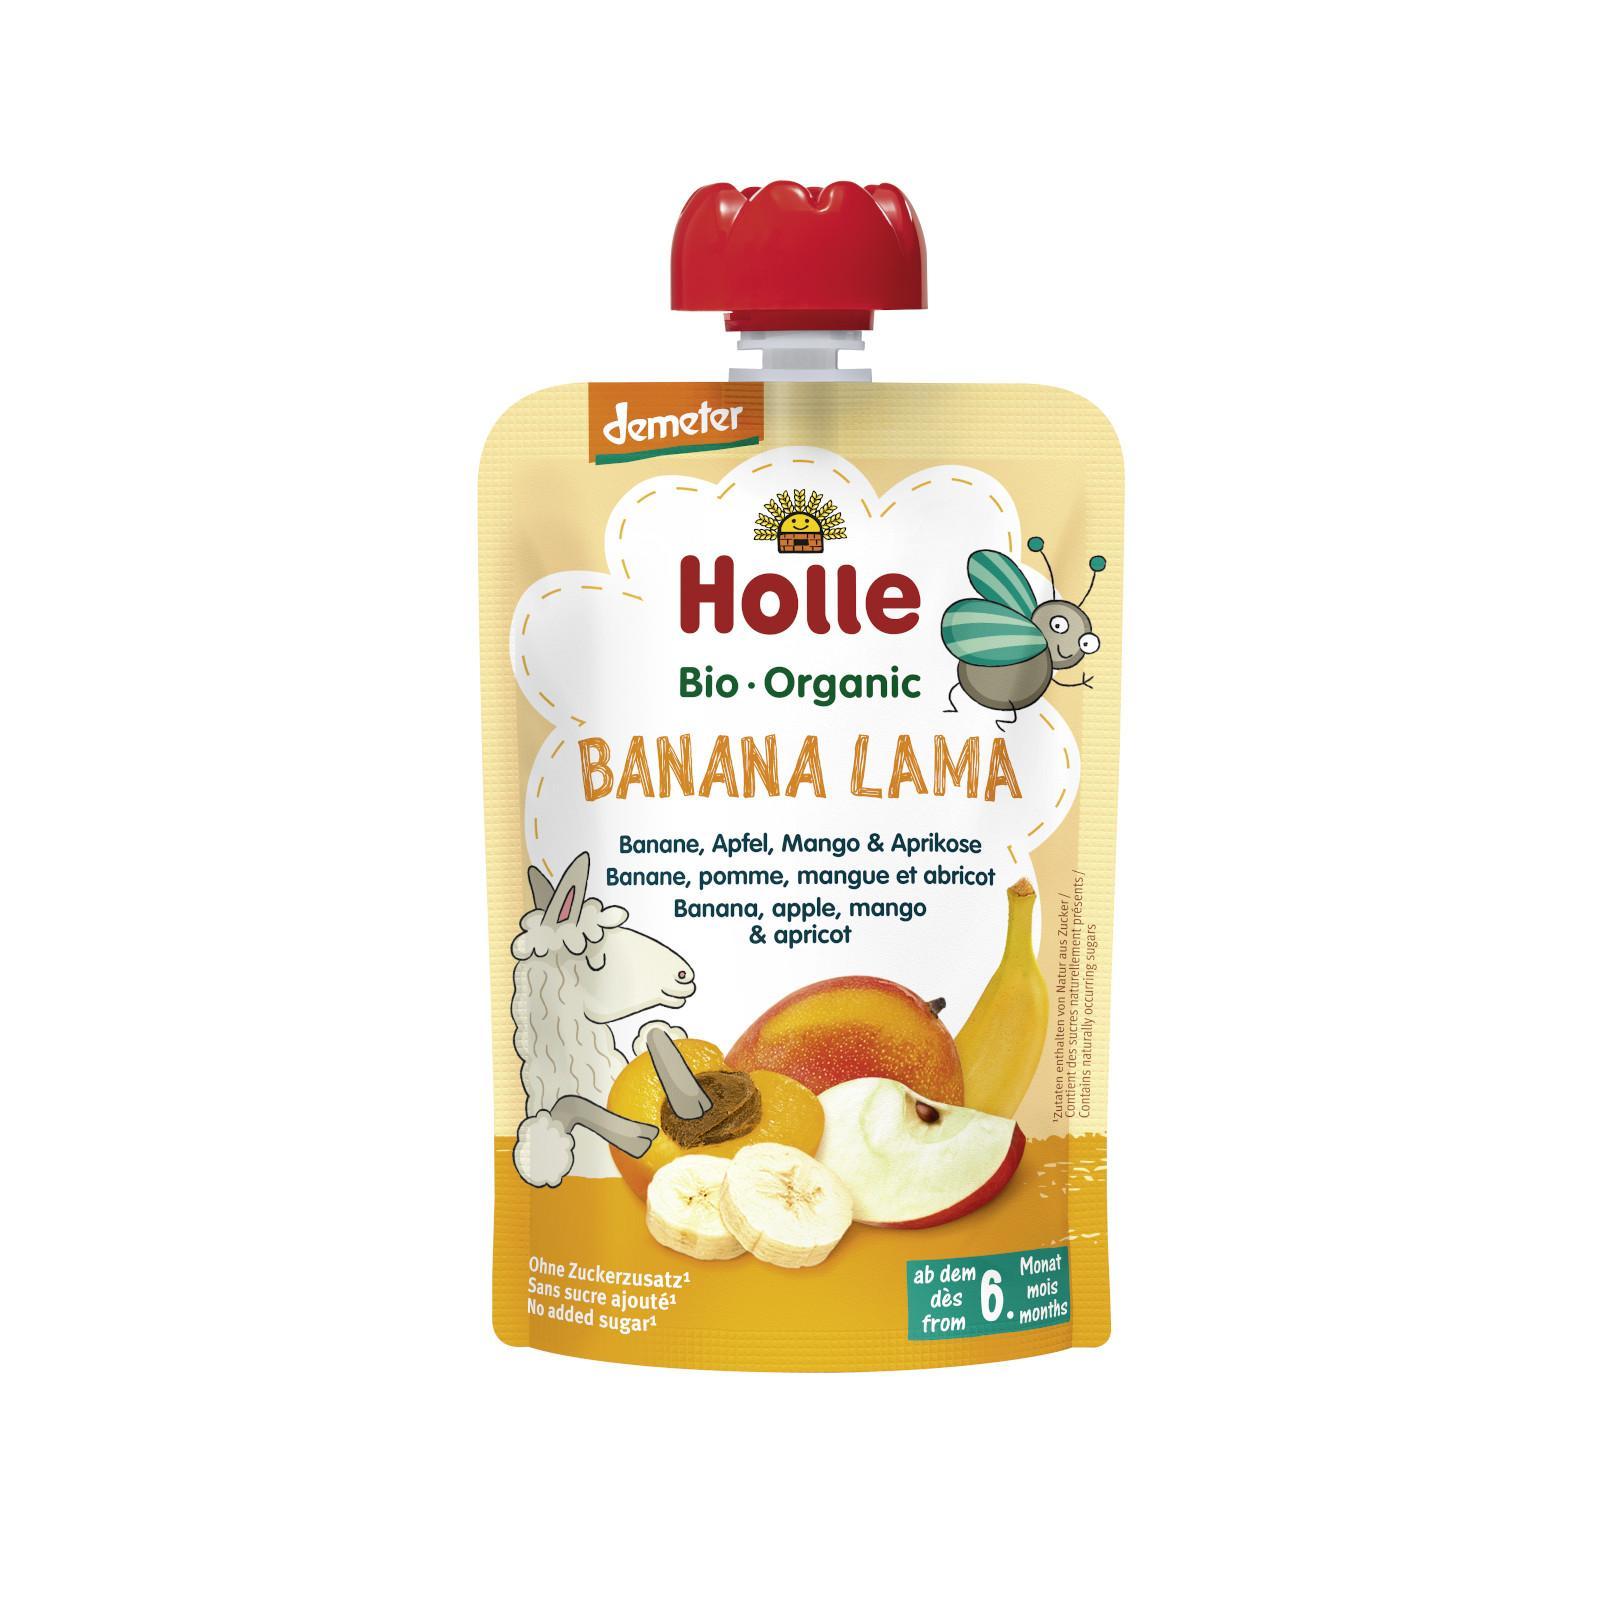 Holle Banana Lama Bio ovocné pyré banán, jablko, mango, meruňka 100 g